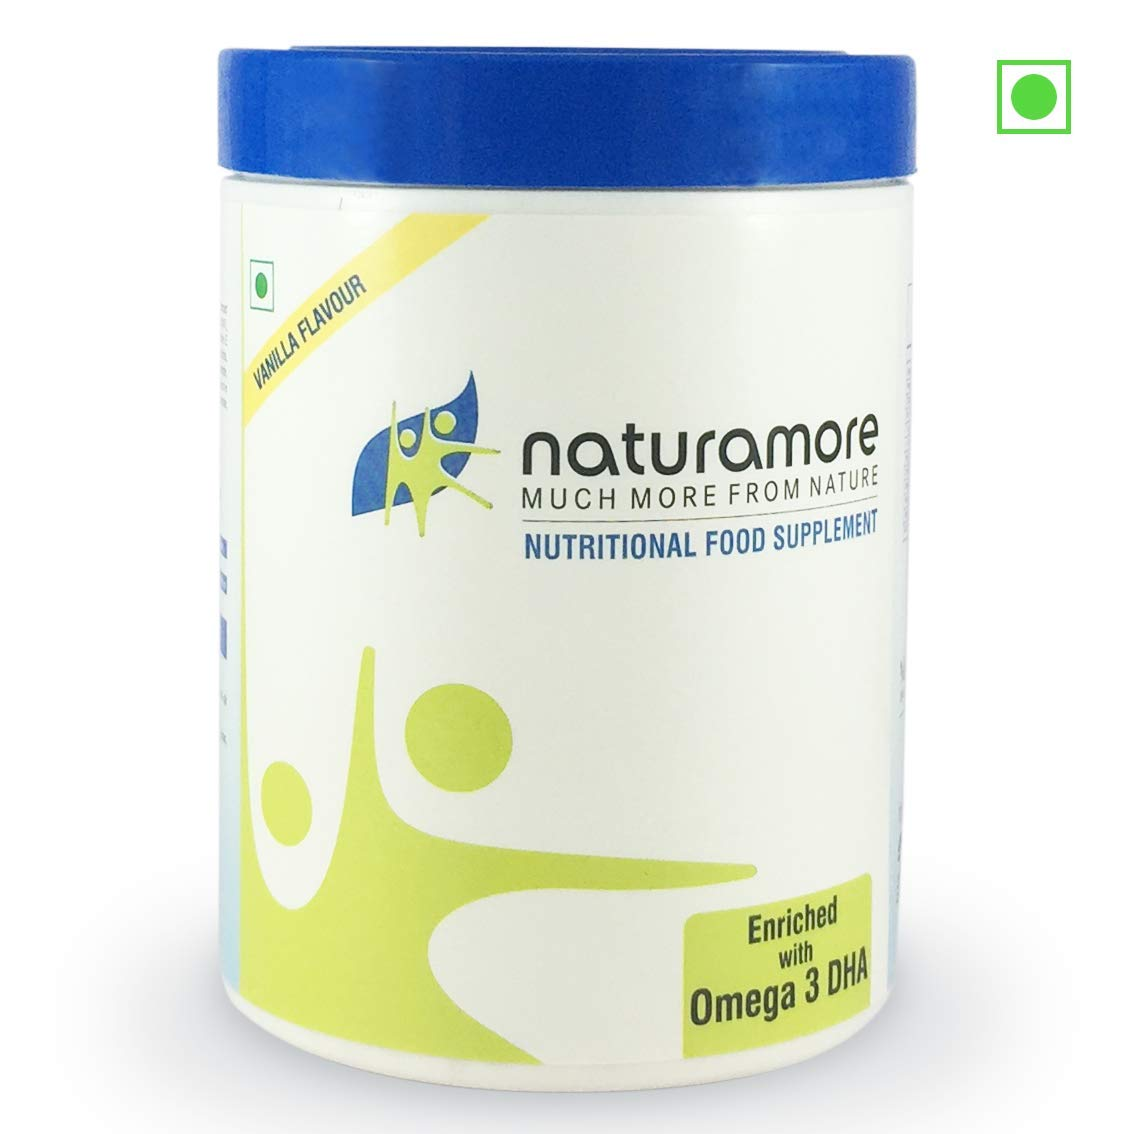 Netsurf Naturamore for Men (Vanilla Flavor) - 250 gm Fast Shipping by Netsurf